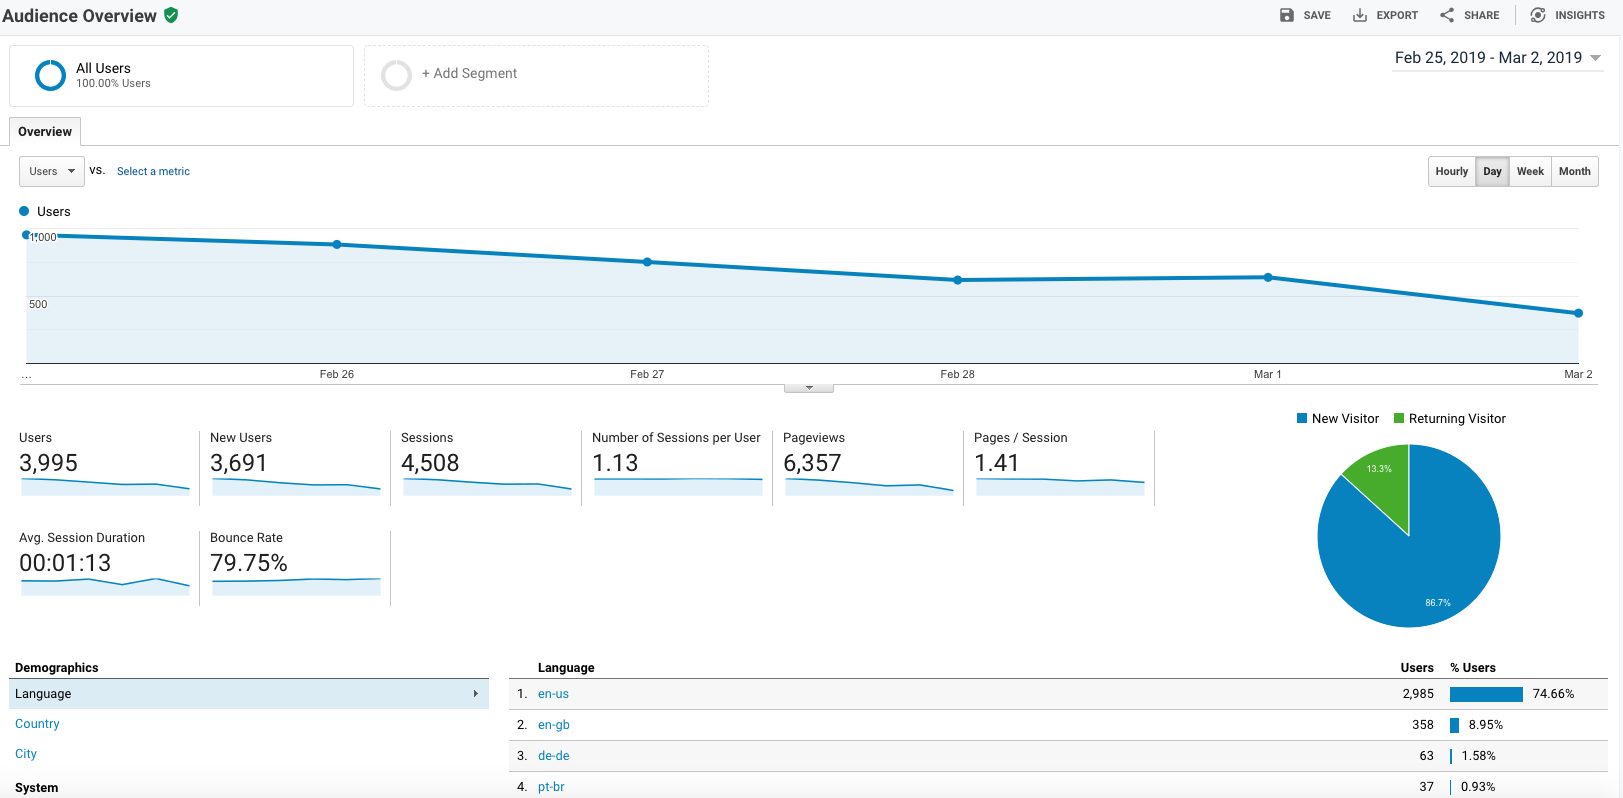 Screenshot of Google Analytics Audience Overview